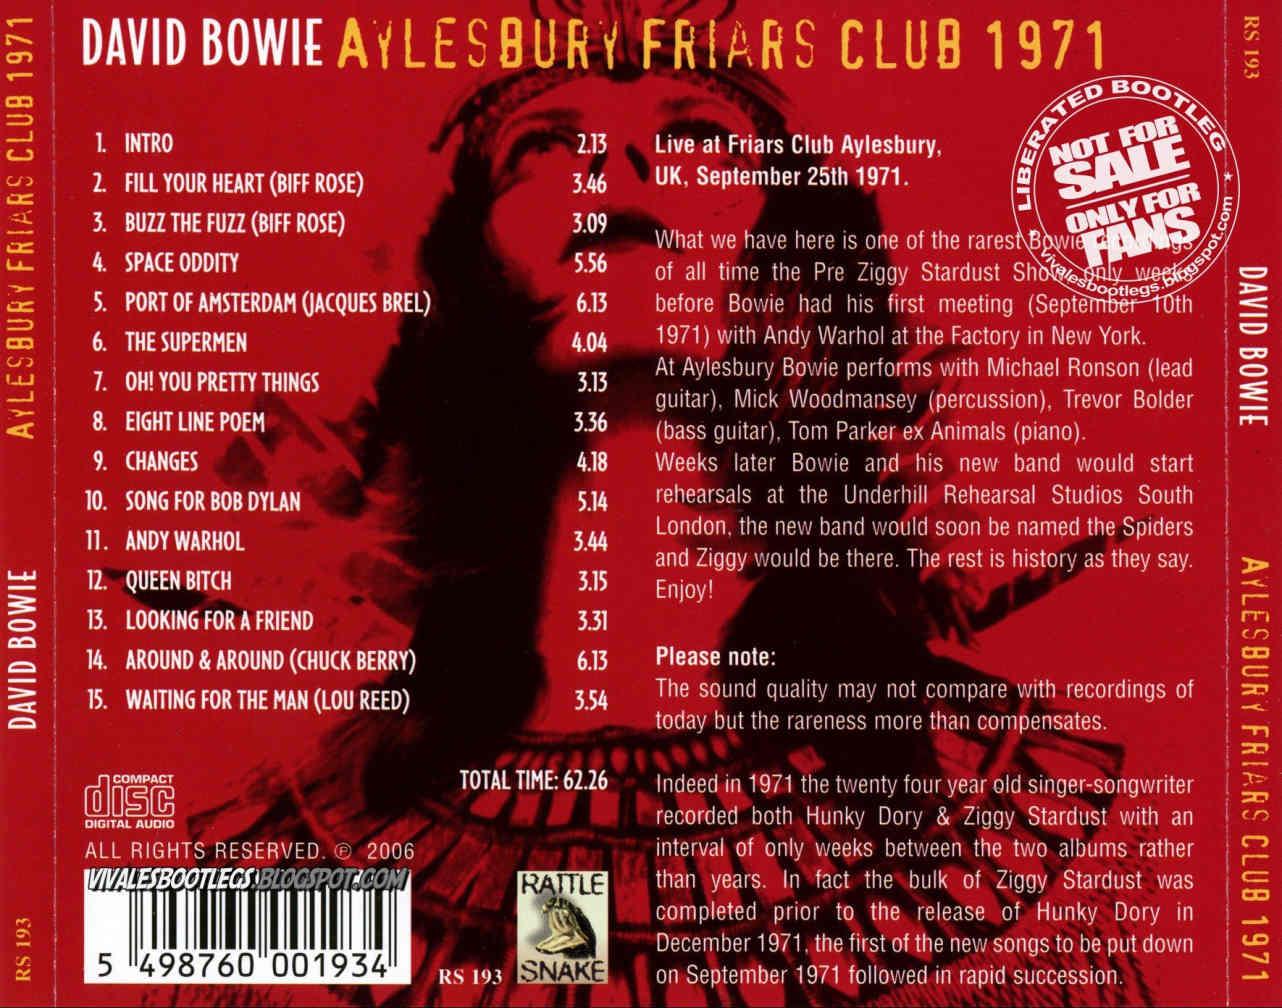 David Bowie - Aylesbury Friars Club 1971